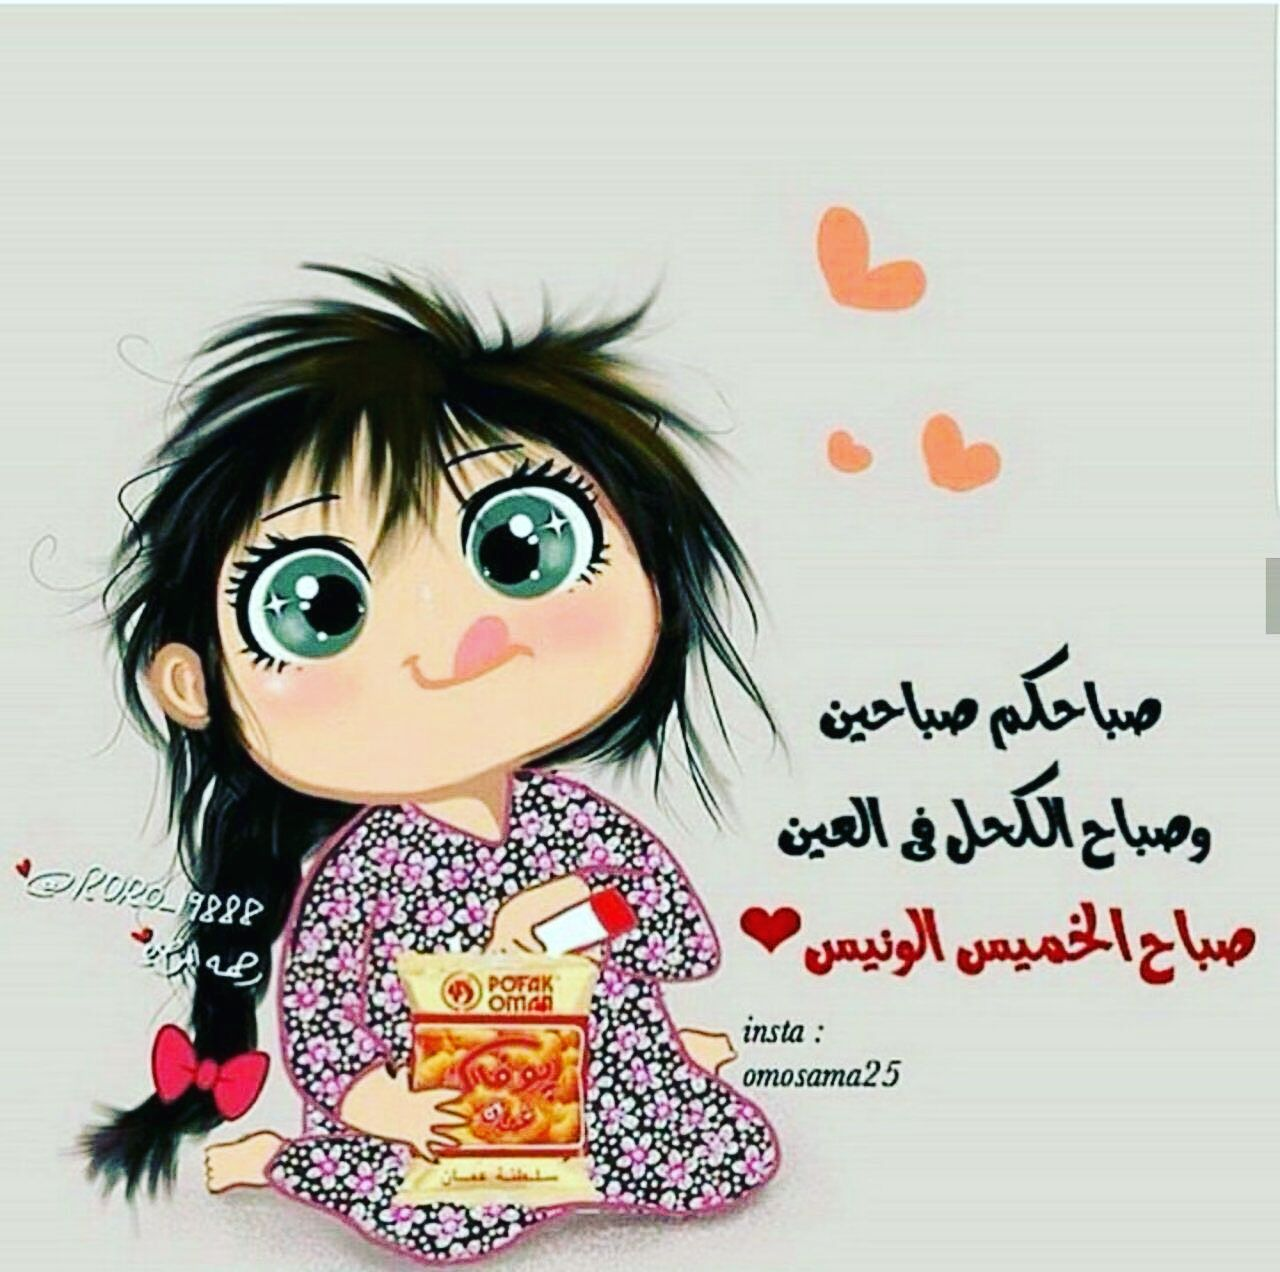 Desertrose صباح الخميس الونيس Morning Greetings Quotes Arabic Funny Morning Images